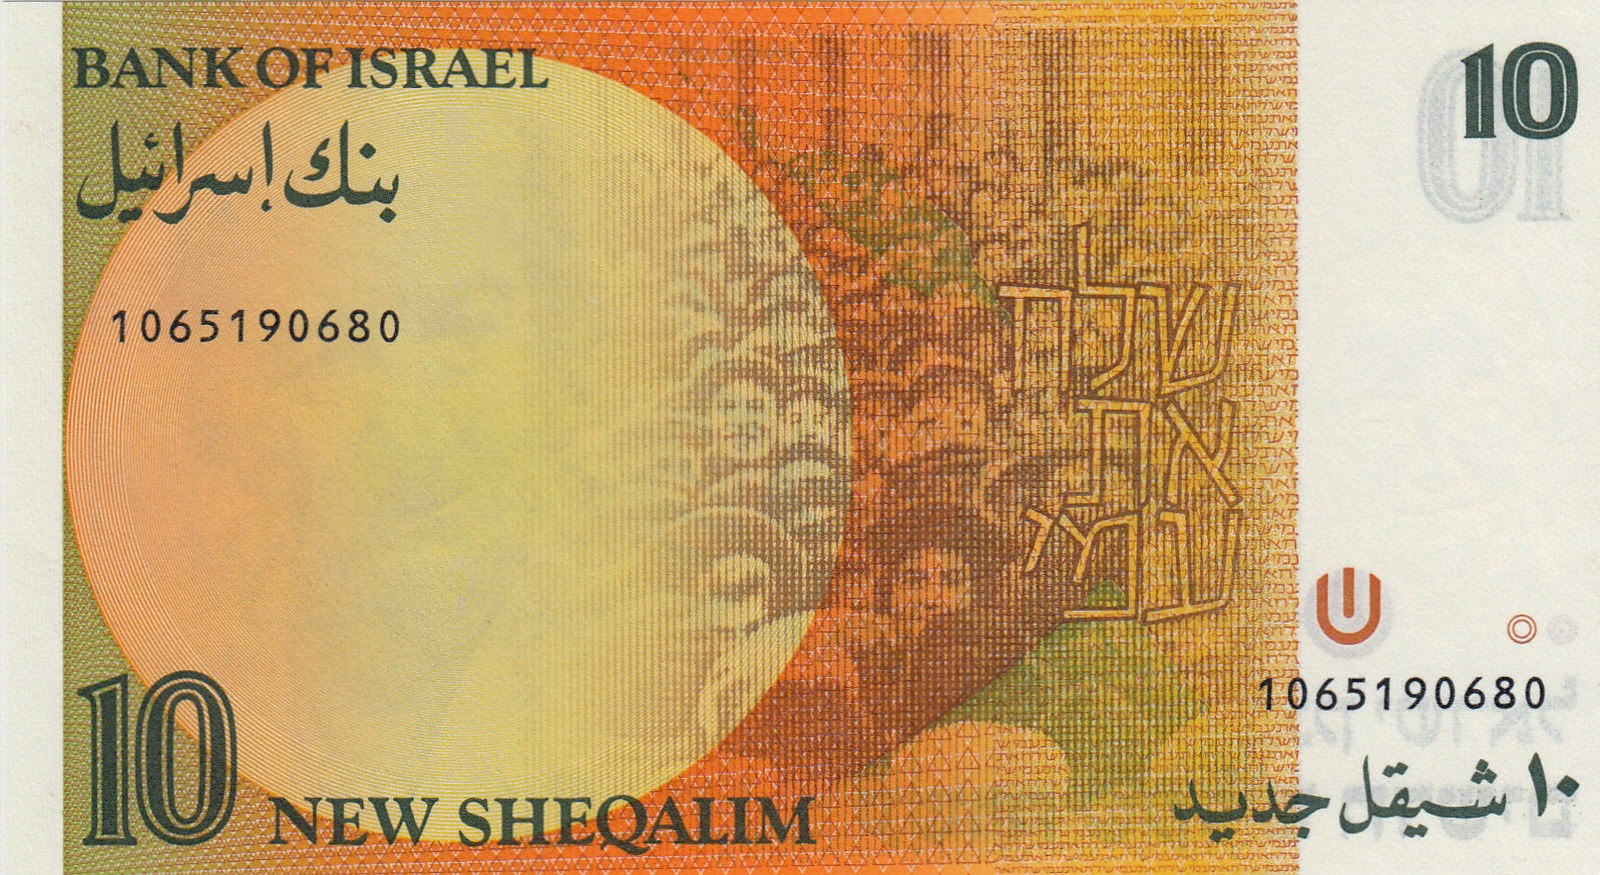 Israeli currency money 10 New Shekels banknote 1992 Bank of Israel